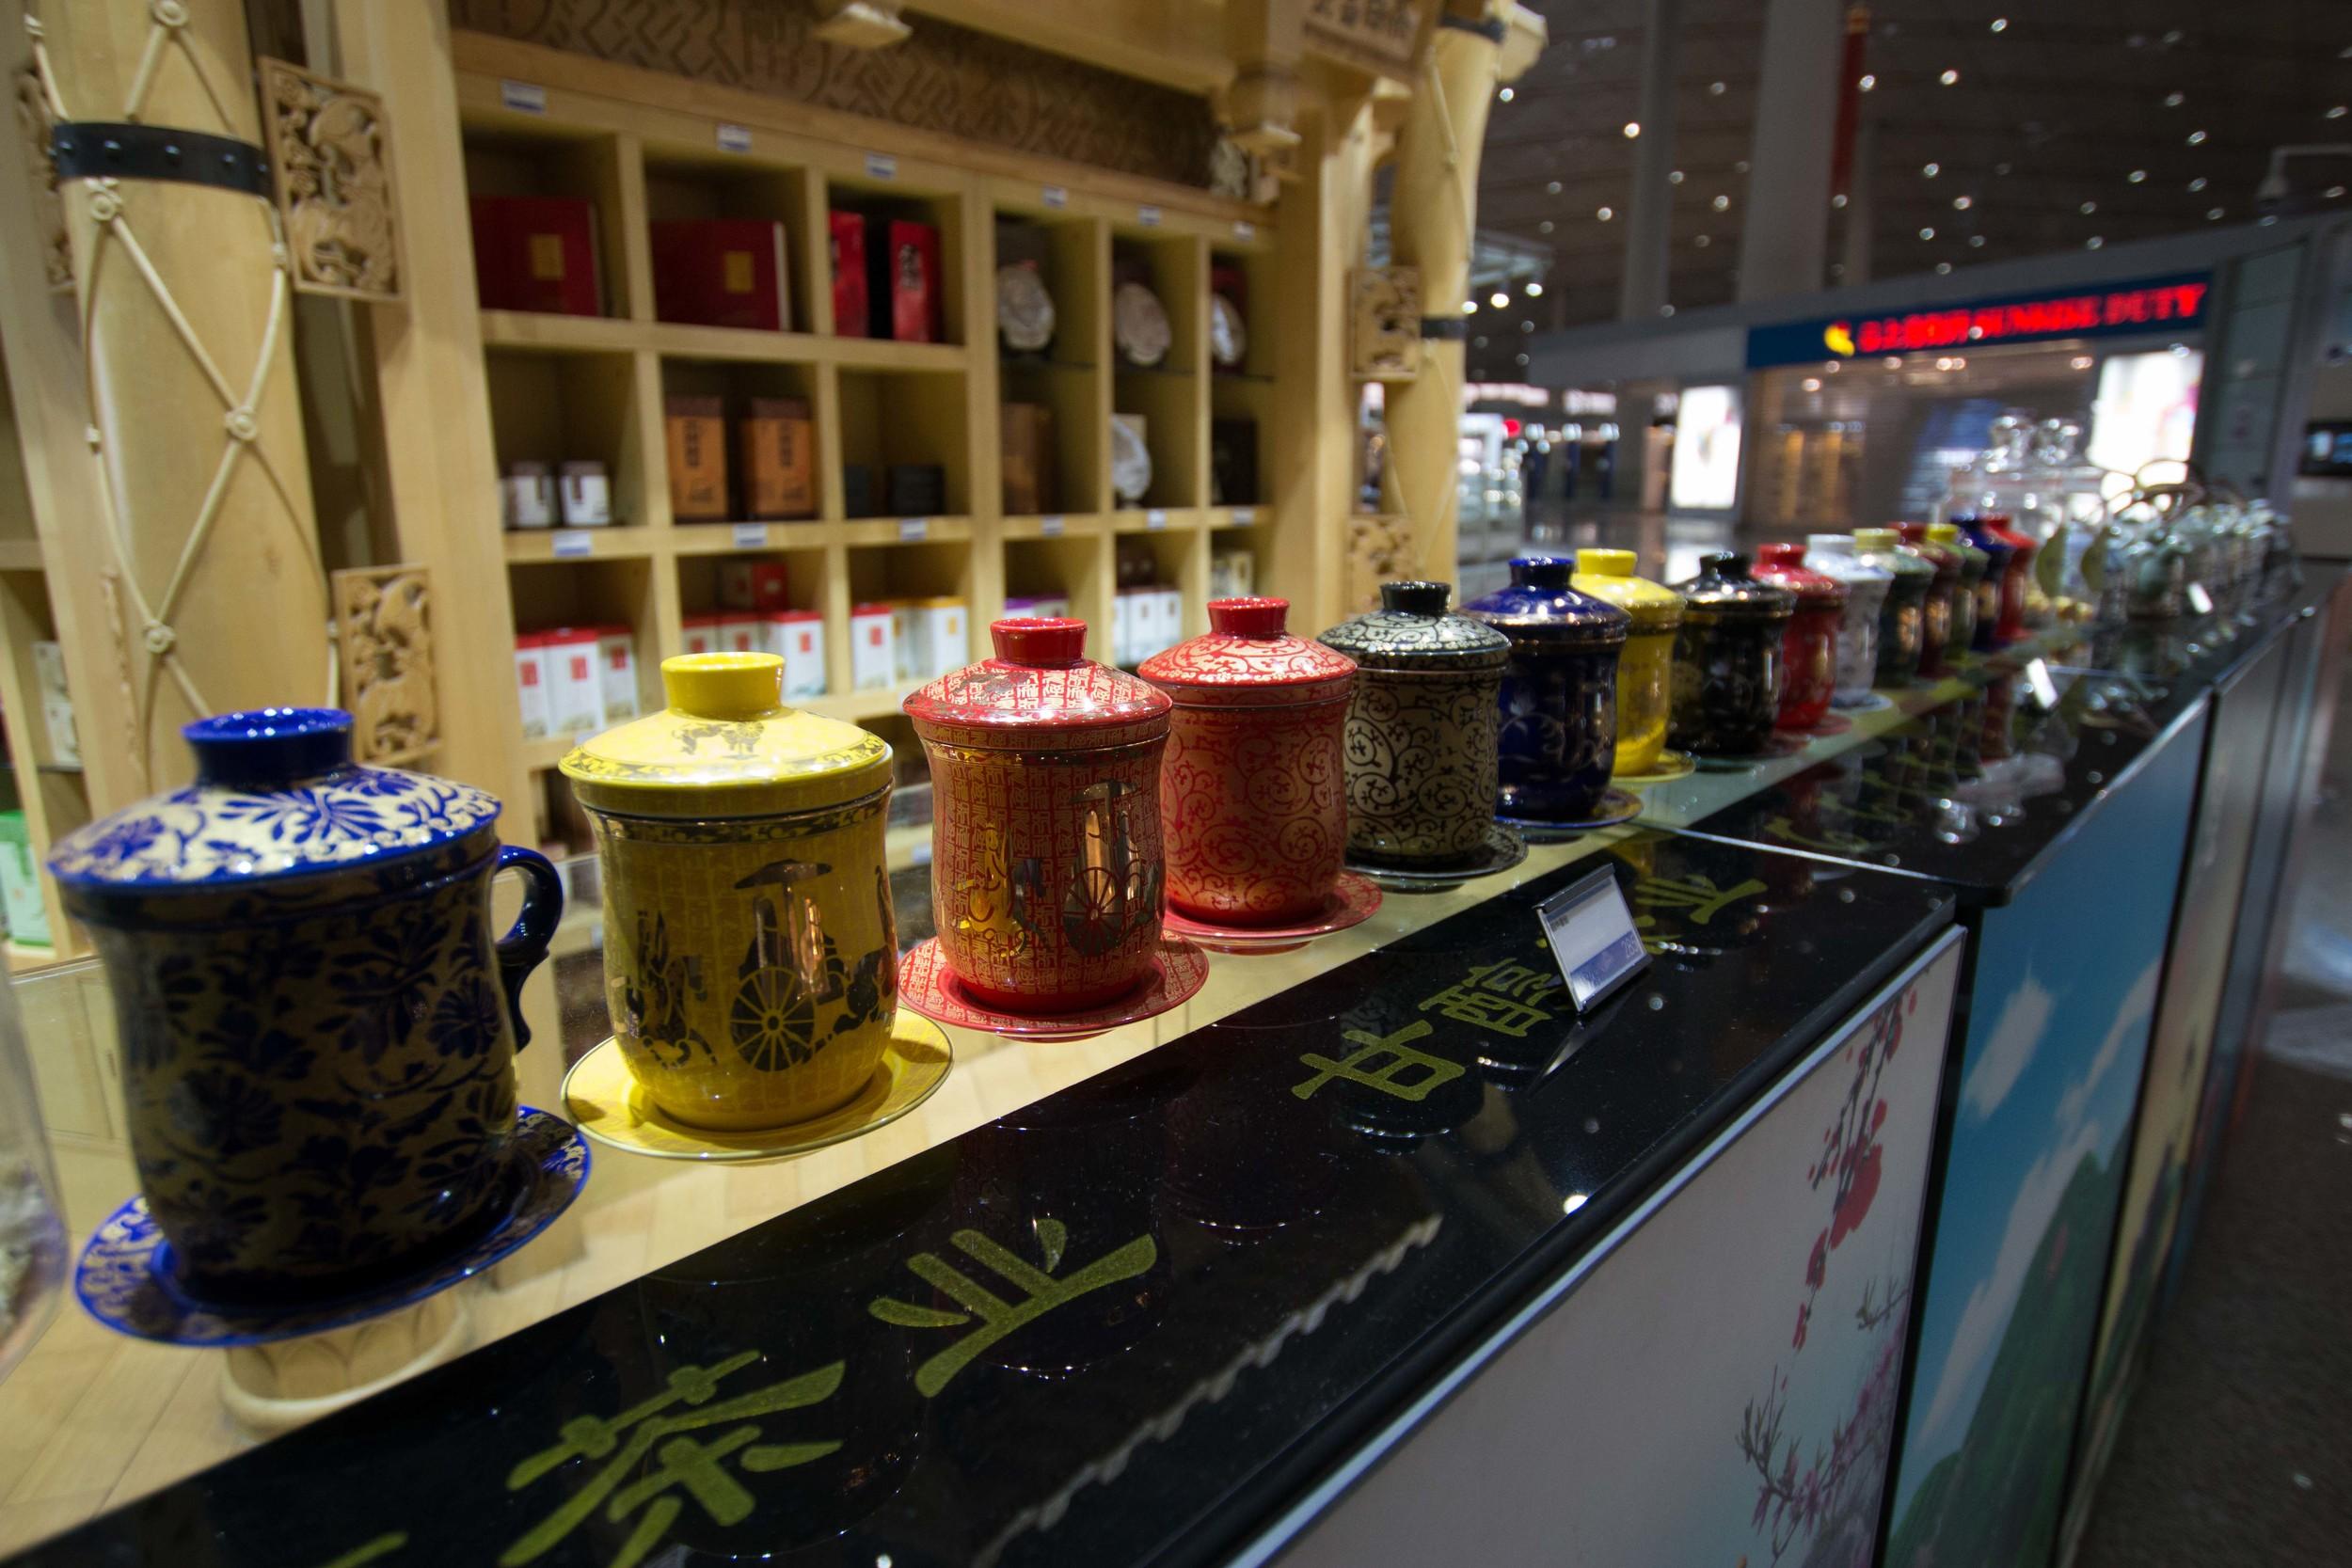 Pretty tea mugs at the airport